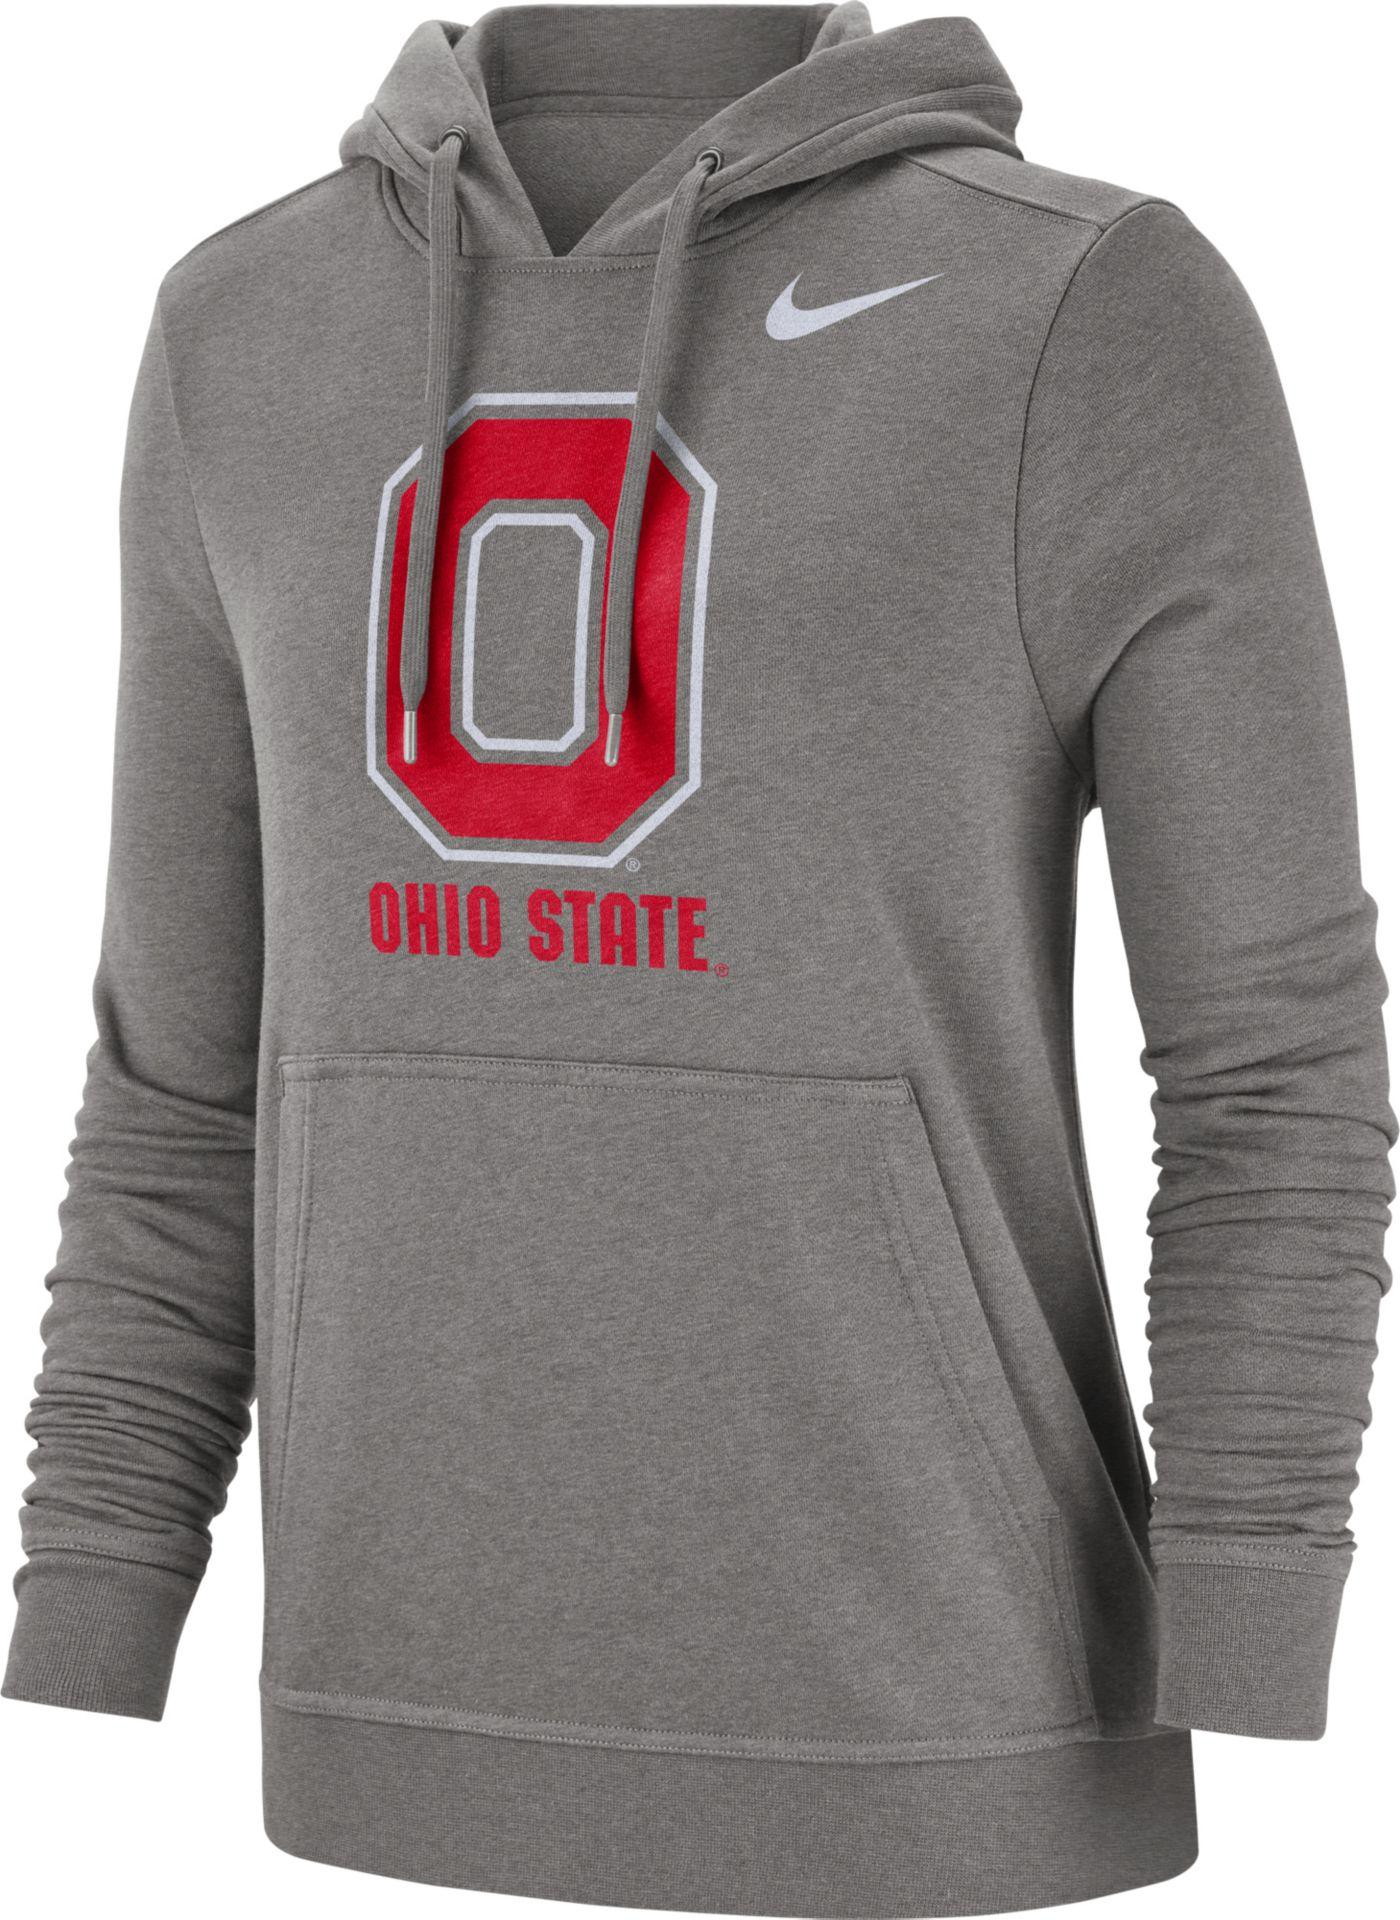 Nike Women's Ohio State Buckeyes Gray Club Fleece Pullover Hoodie